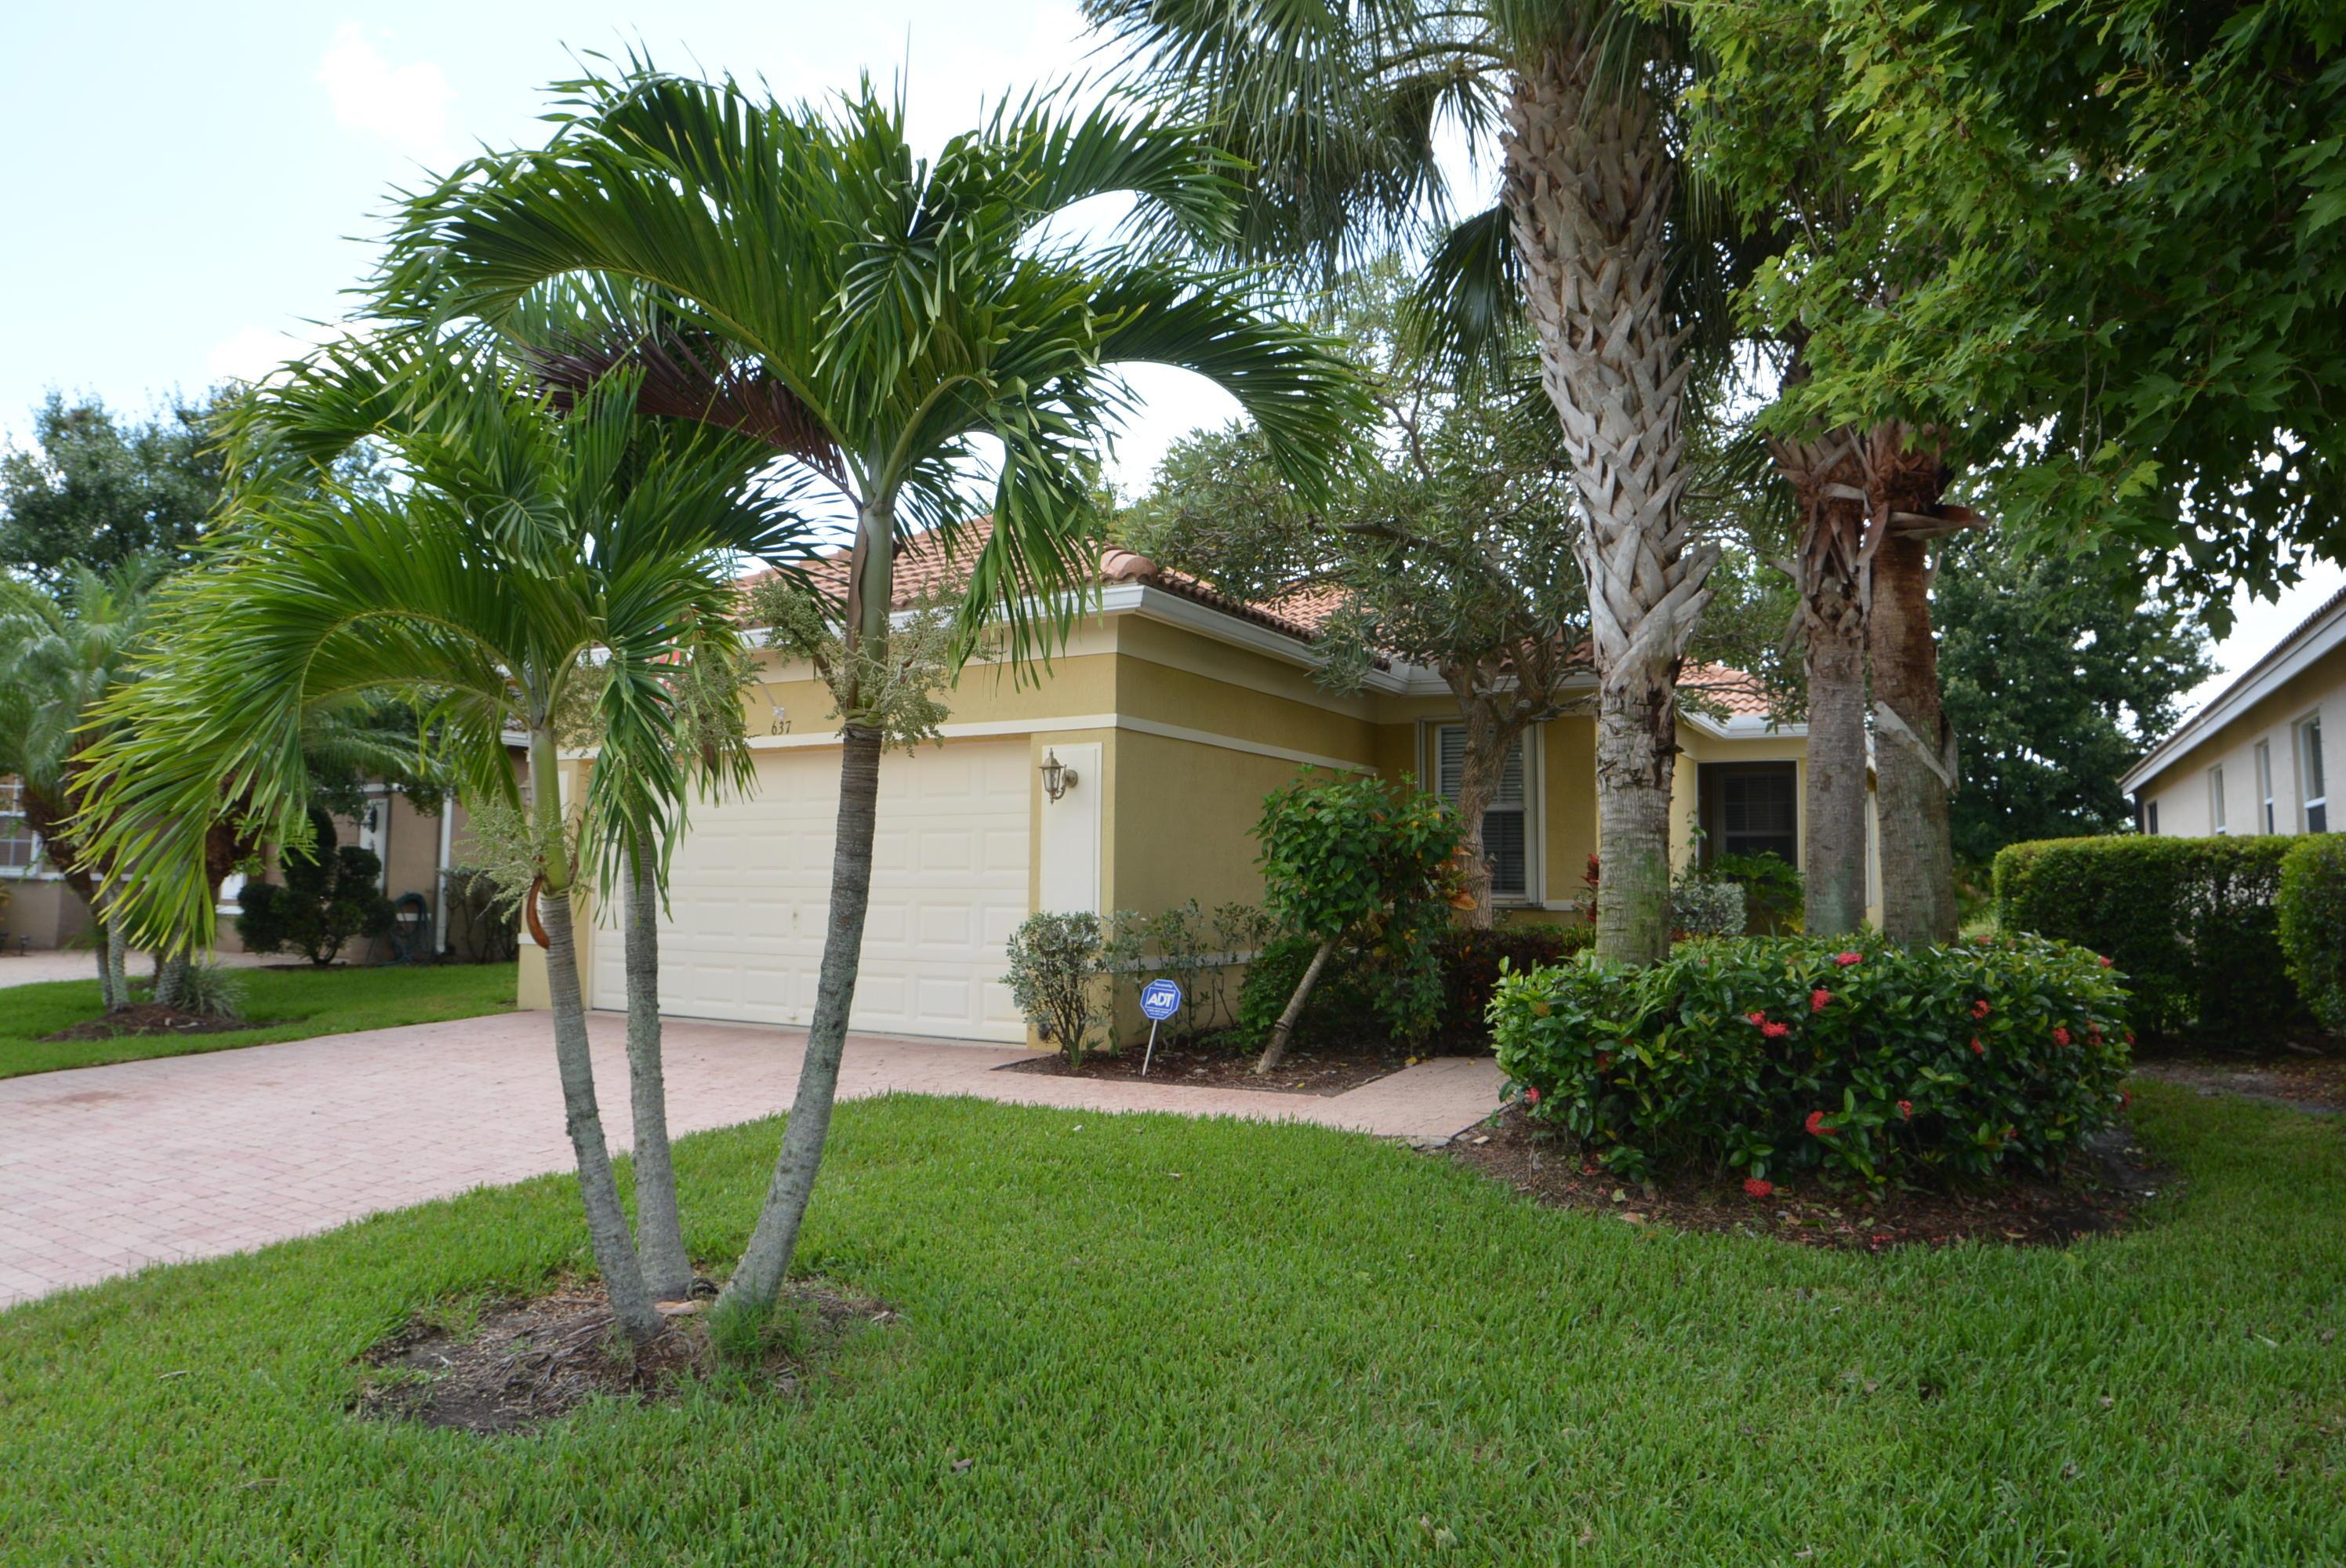 637 Nw Stanford Lane, Port Saint Lucie, FL 34983